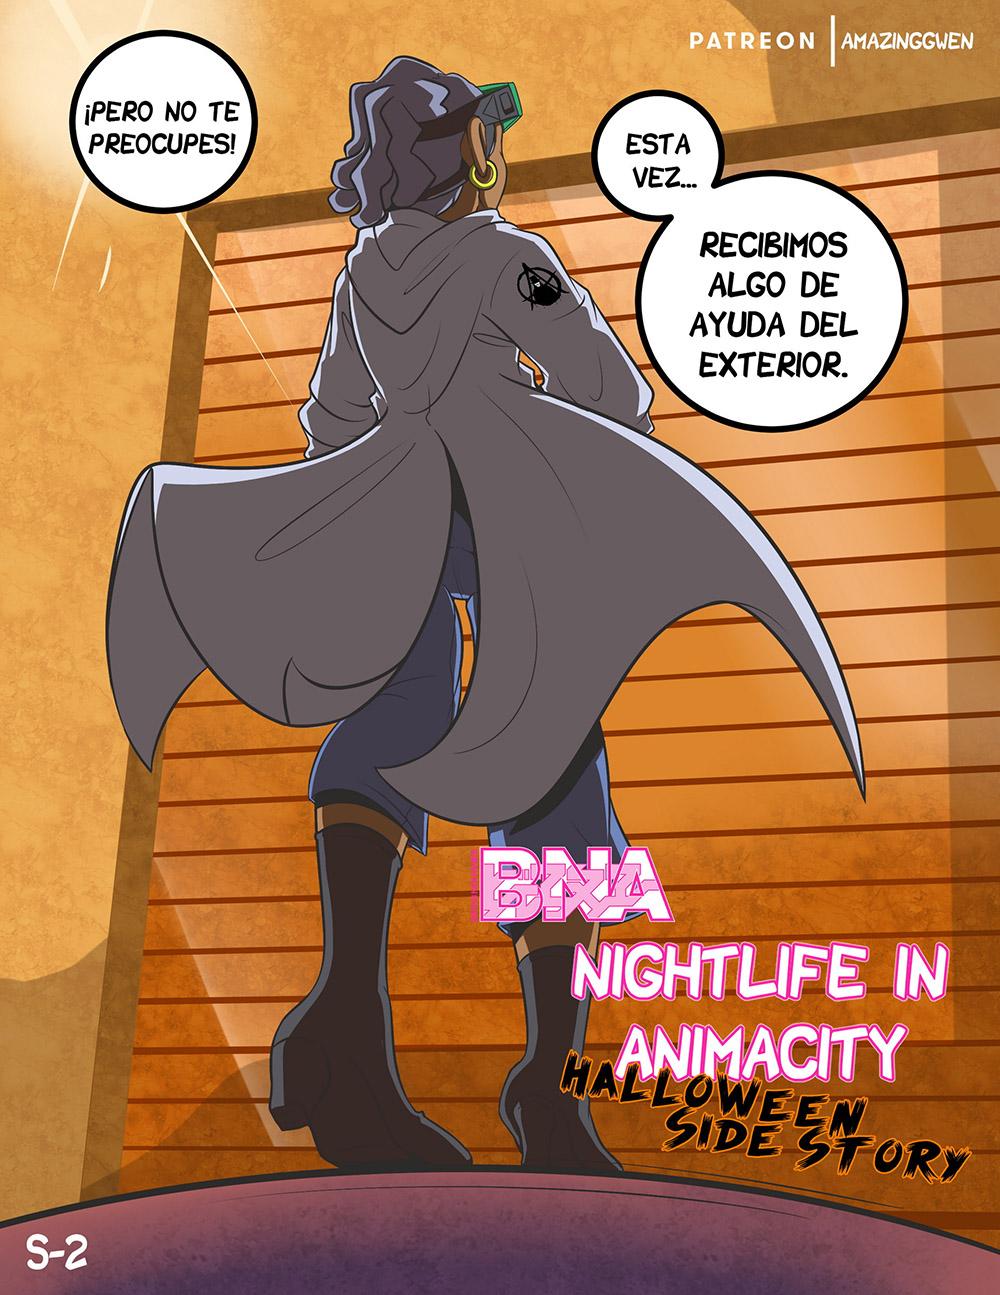 NIGHTLIFE in Animacity - Halloween Side Story